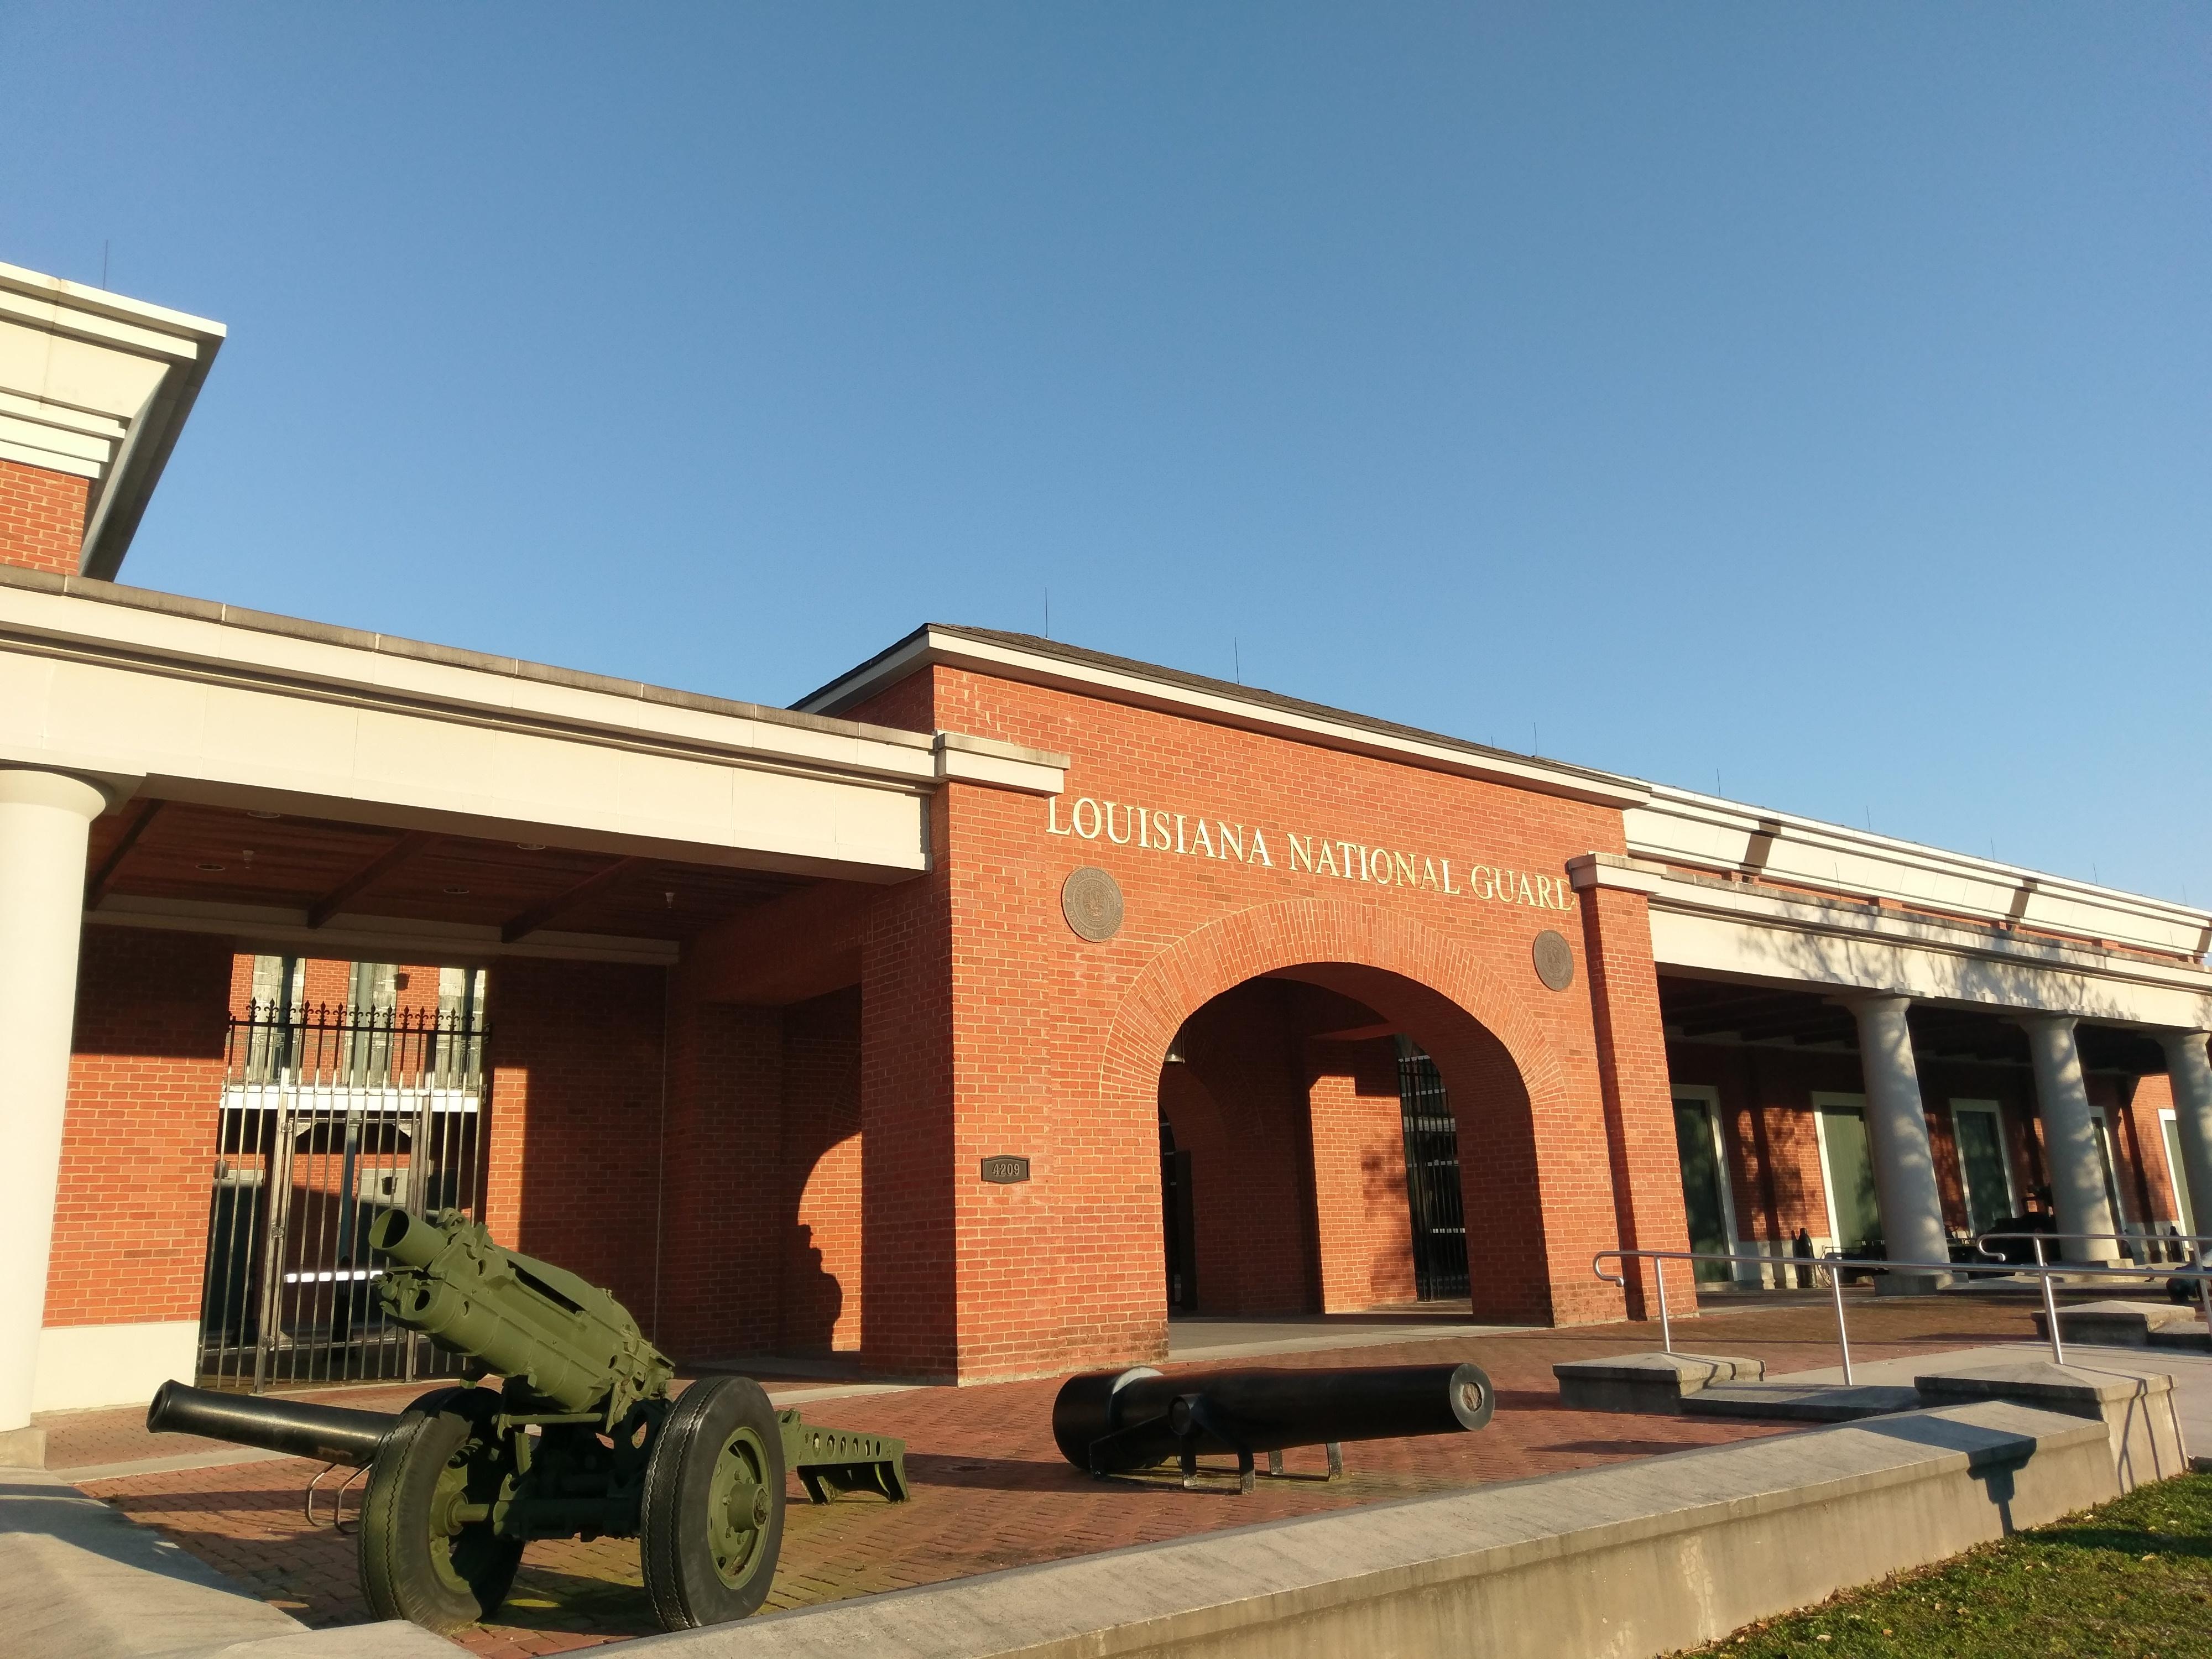 Louisiana National Guard Jackson Barracks